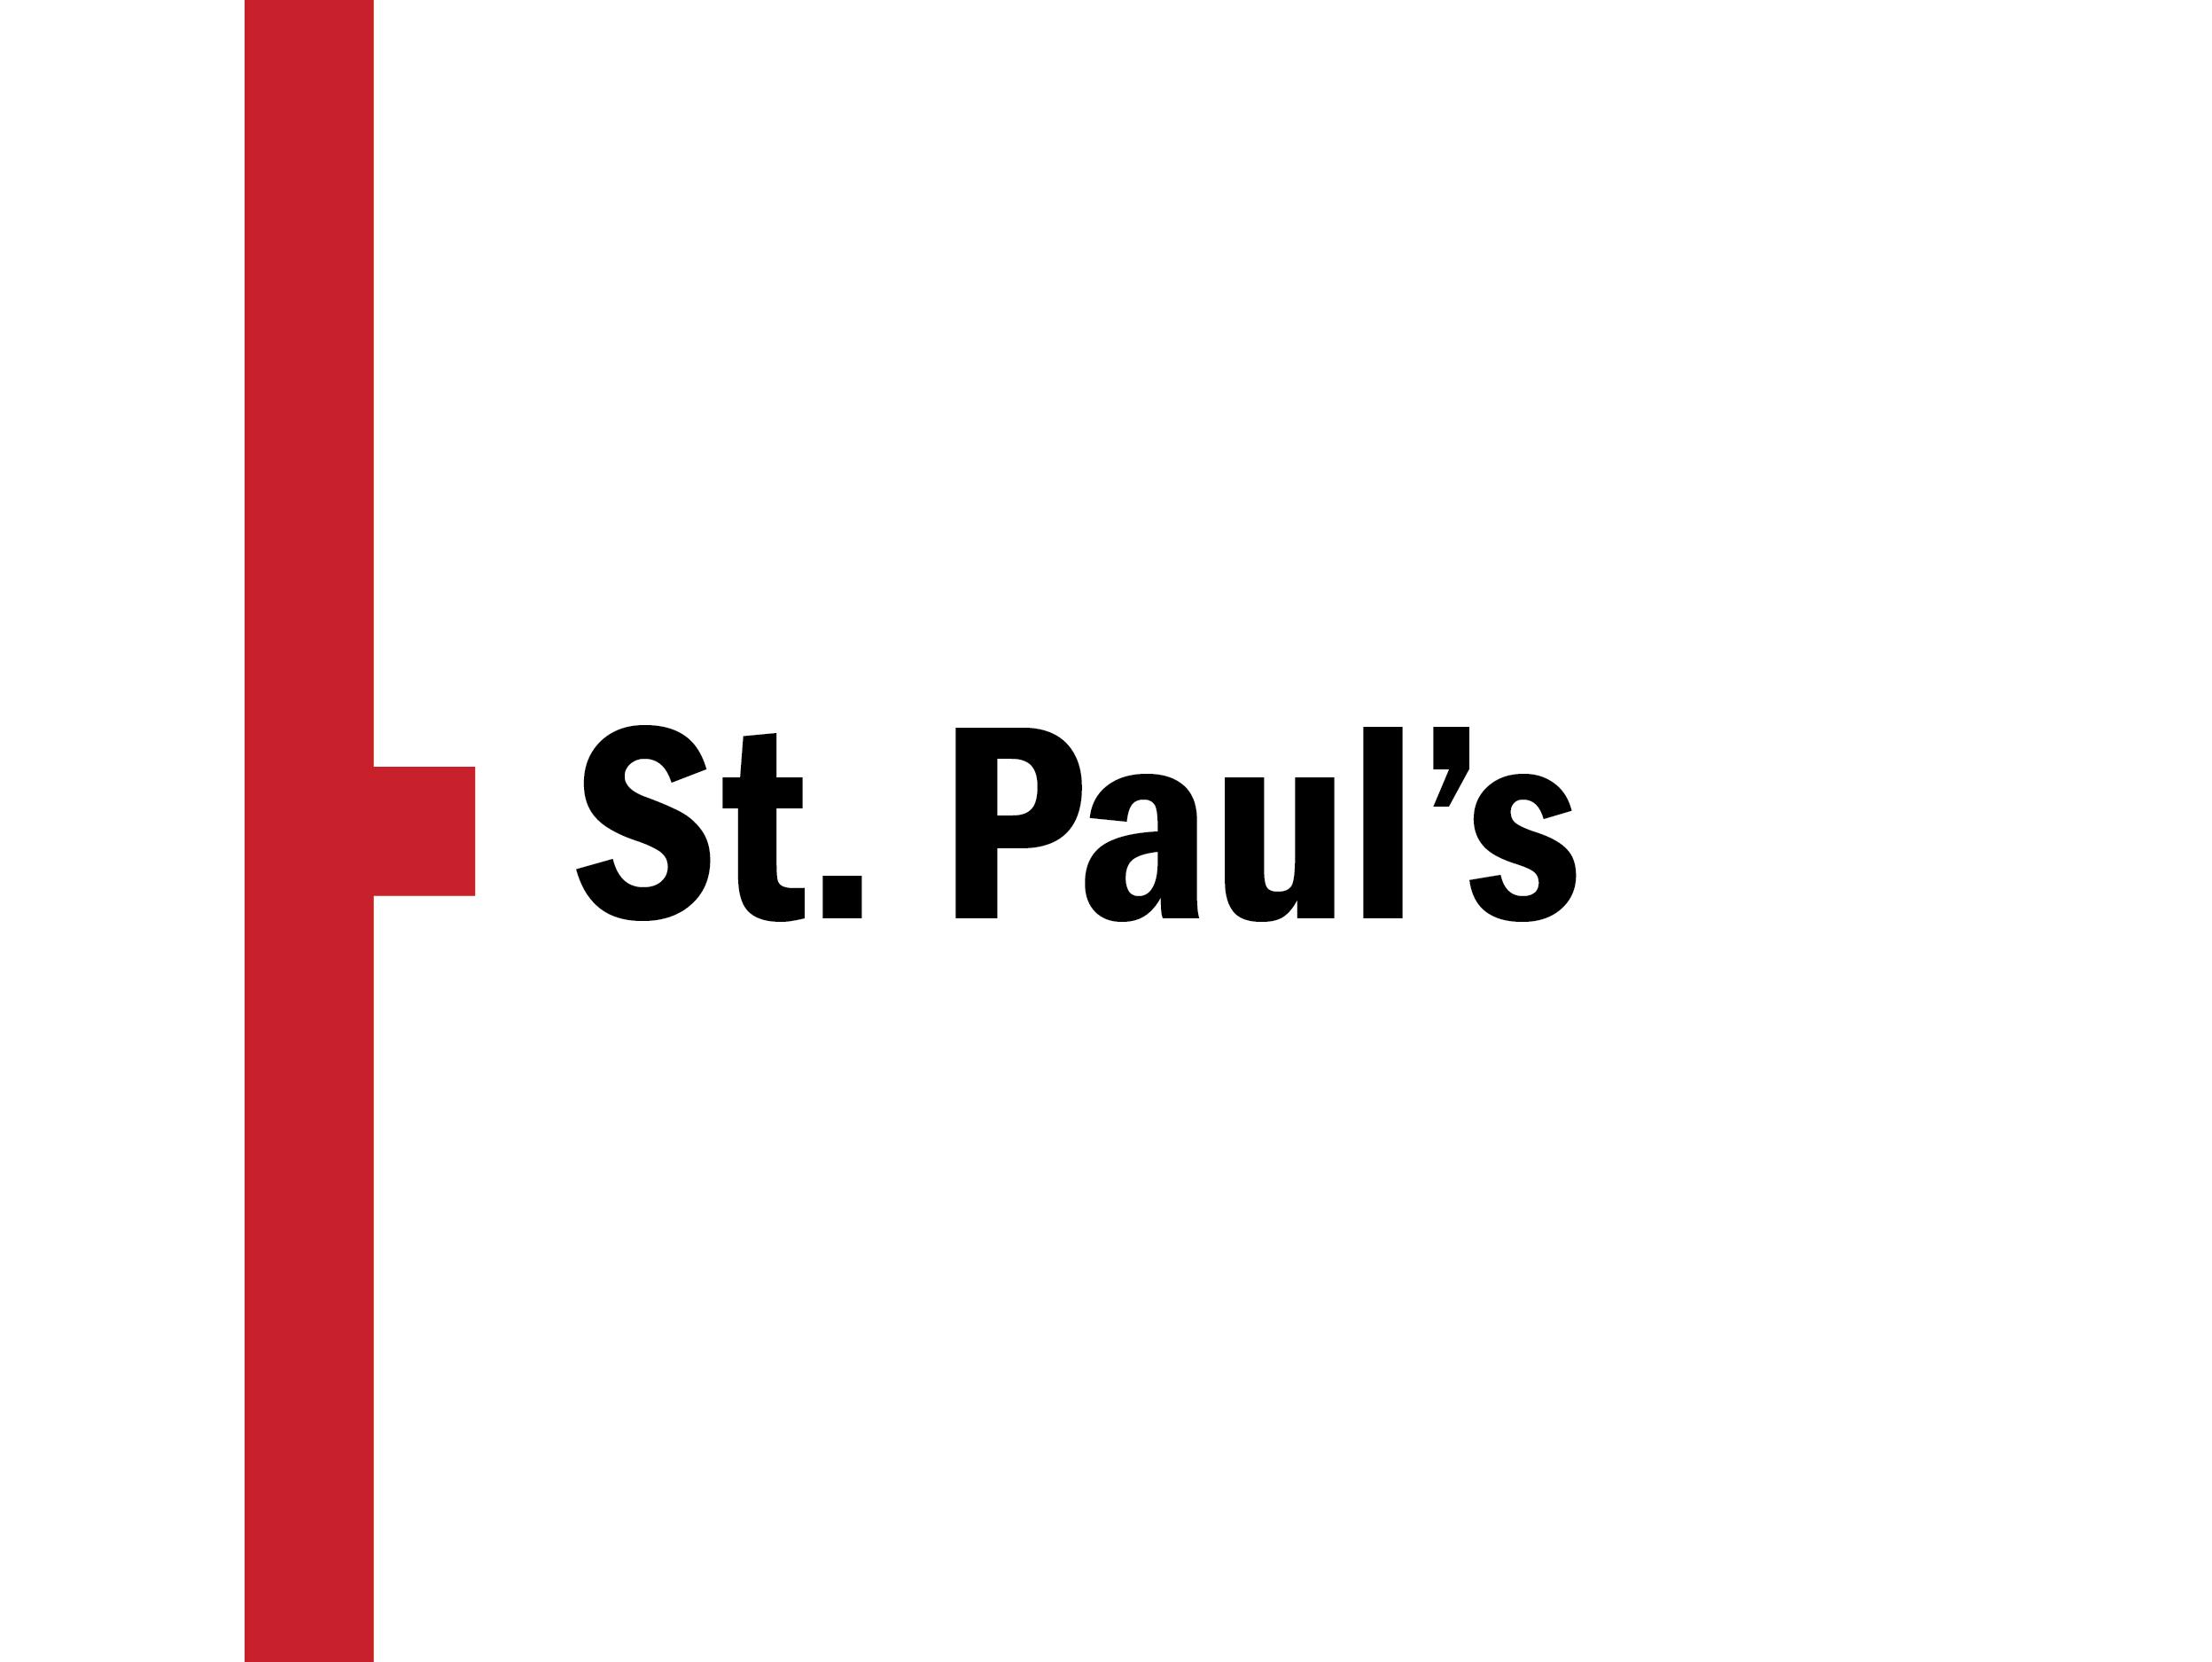 Night tube: St Paul's